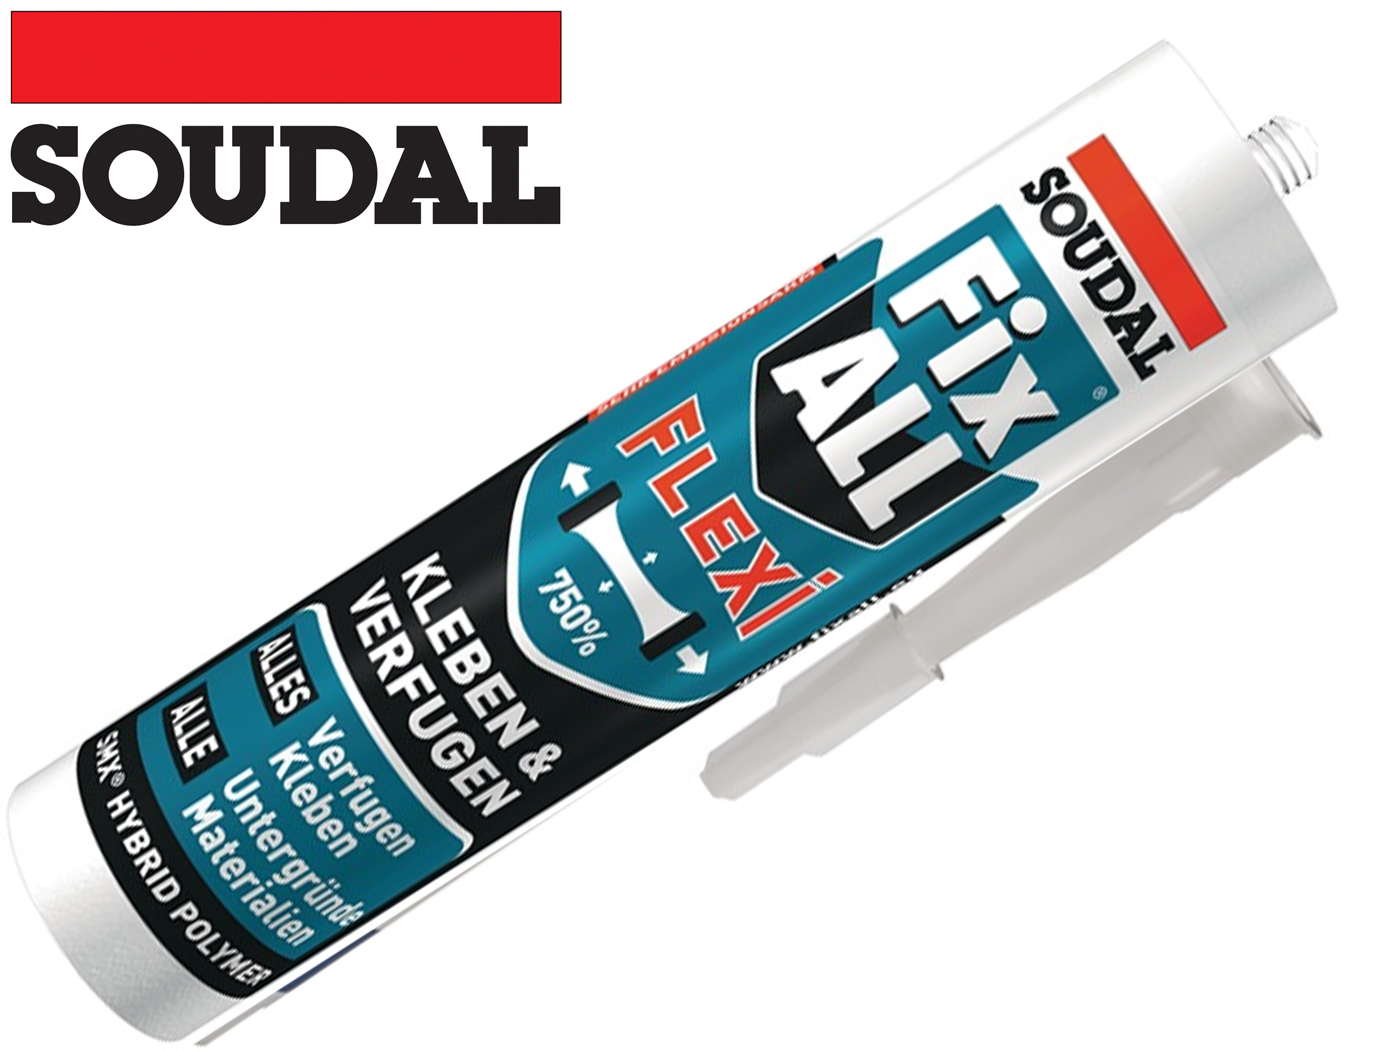 1K lijm / afdichtmiddel Fix alle Flexi 470g witte cartridge SOUDAL